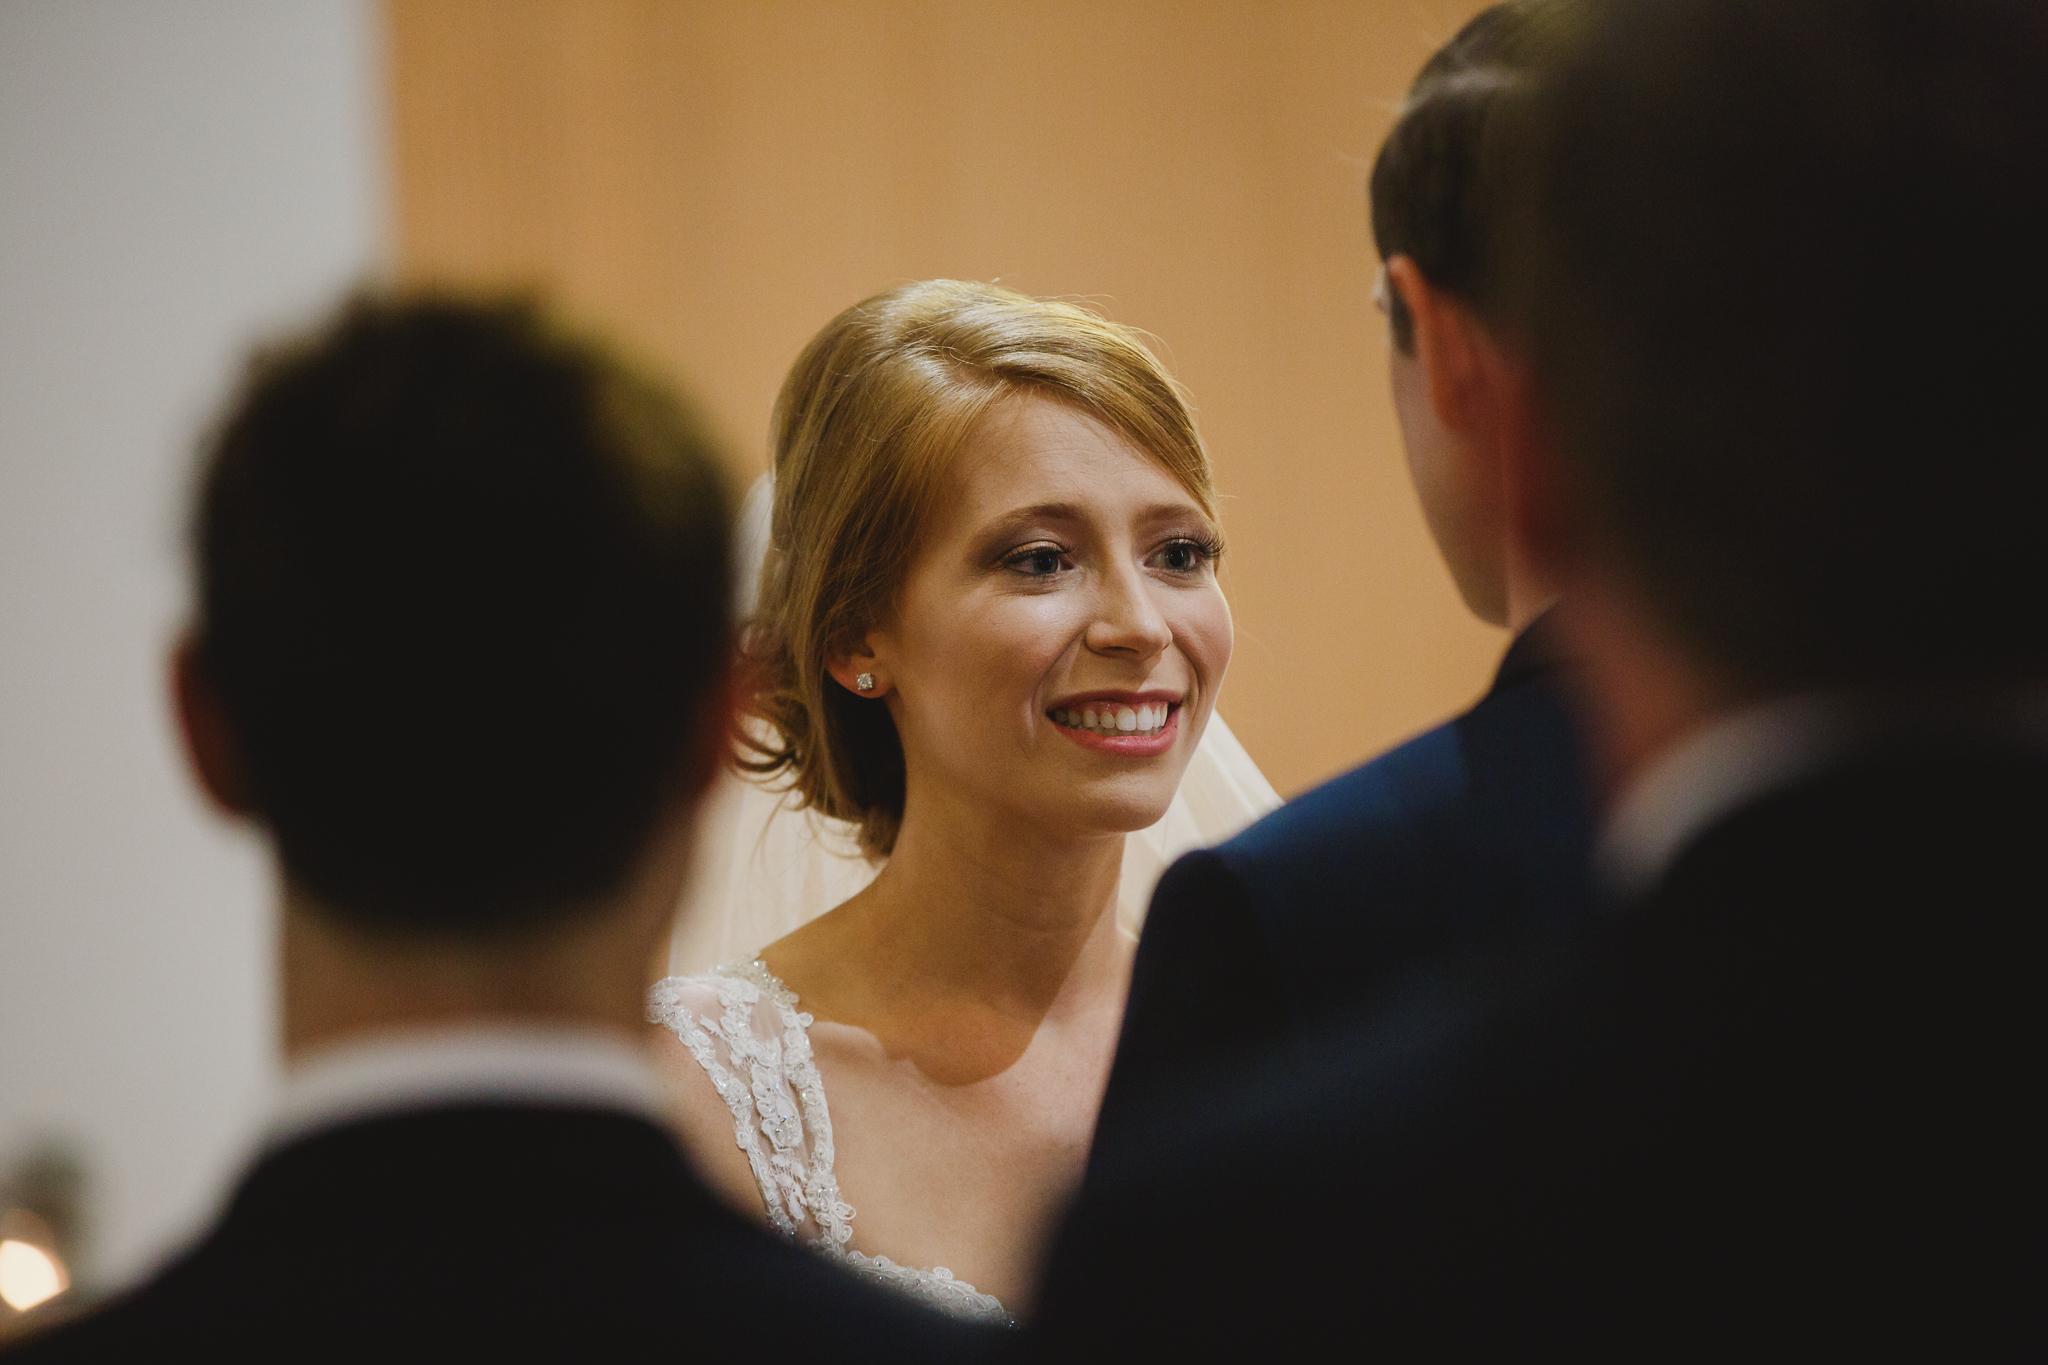 Michael and Kelly - the ashton depot - wedding DFW - wedding photographer- elizalde photography (46 of 150).jpg